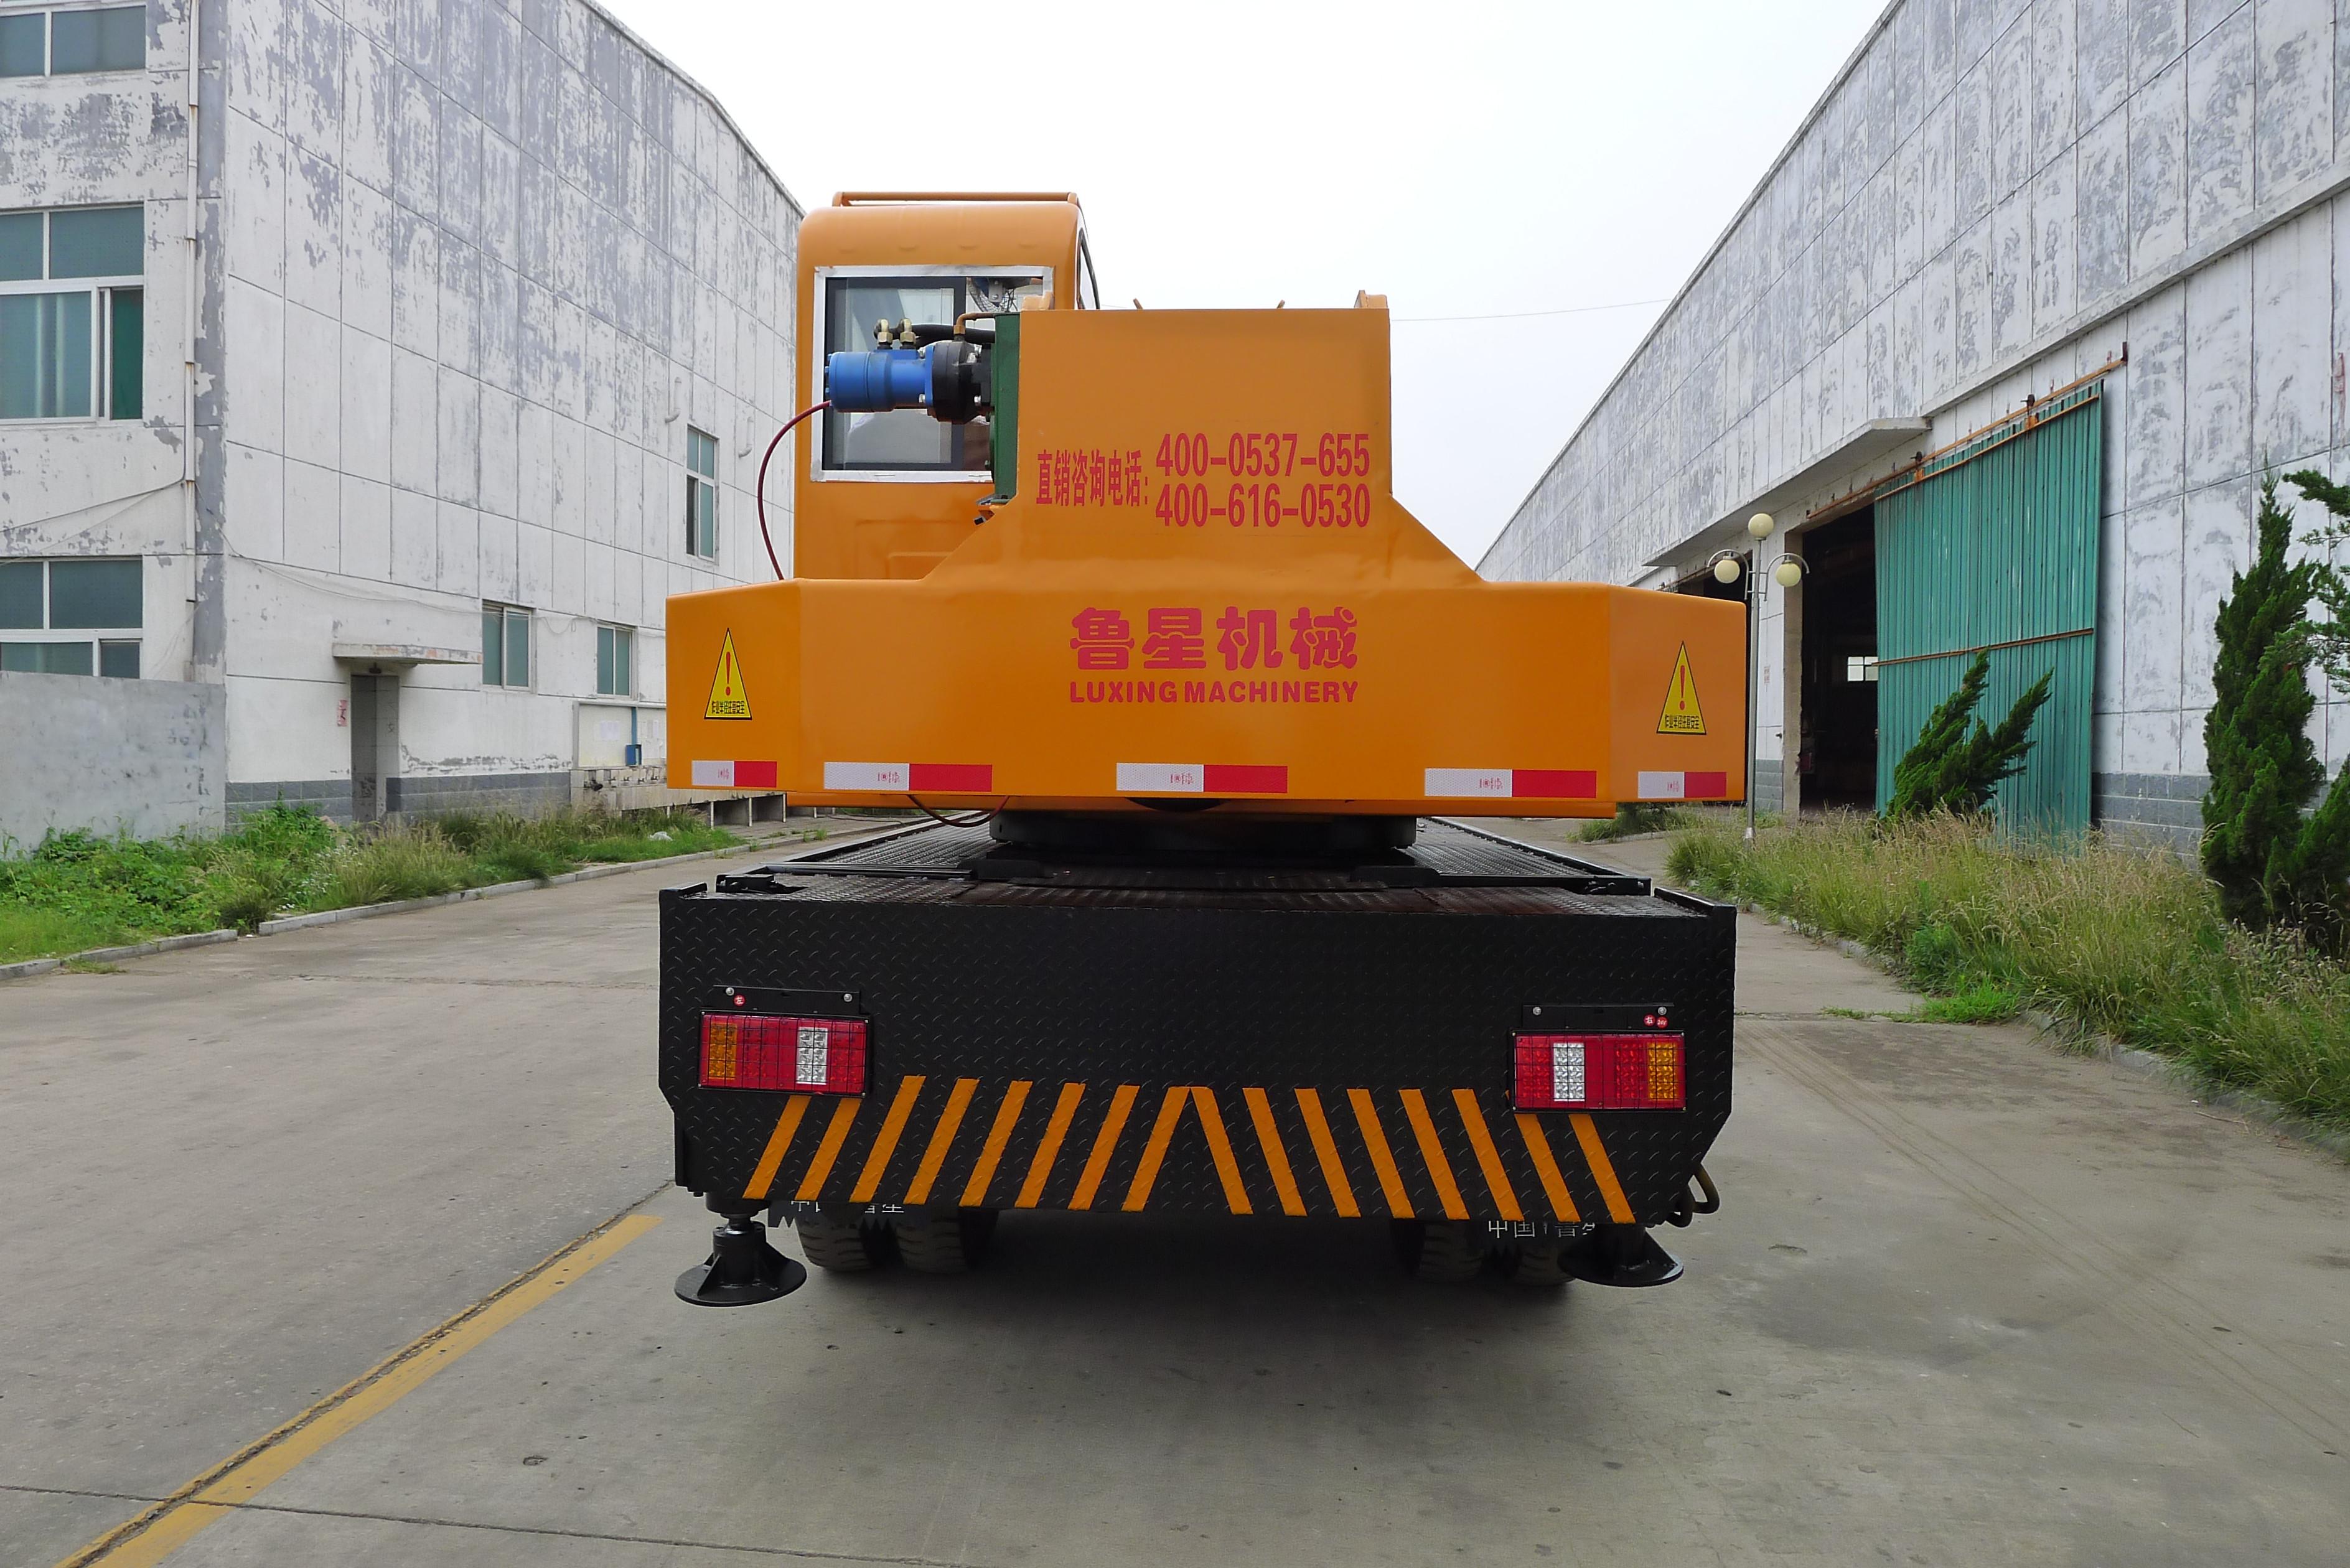 Mobile Crane Kato 20 Ton : List manufacturers of kato mobile crane buy